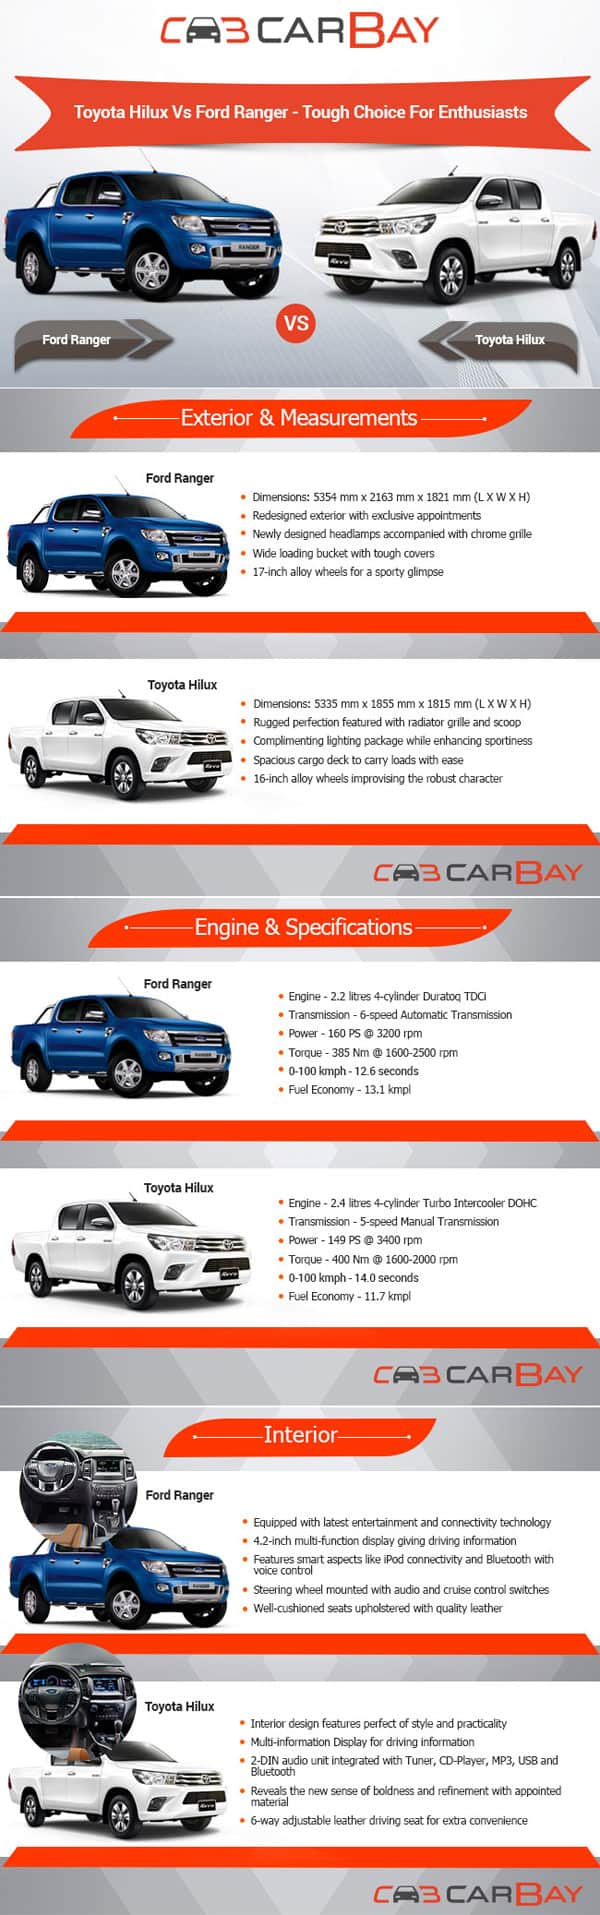 Toyota Hilux vs Ford Ranger Infographic